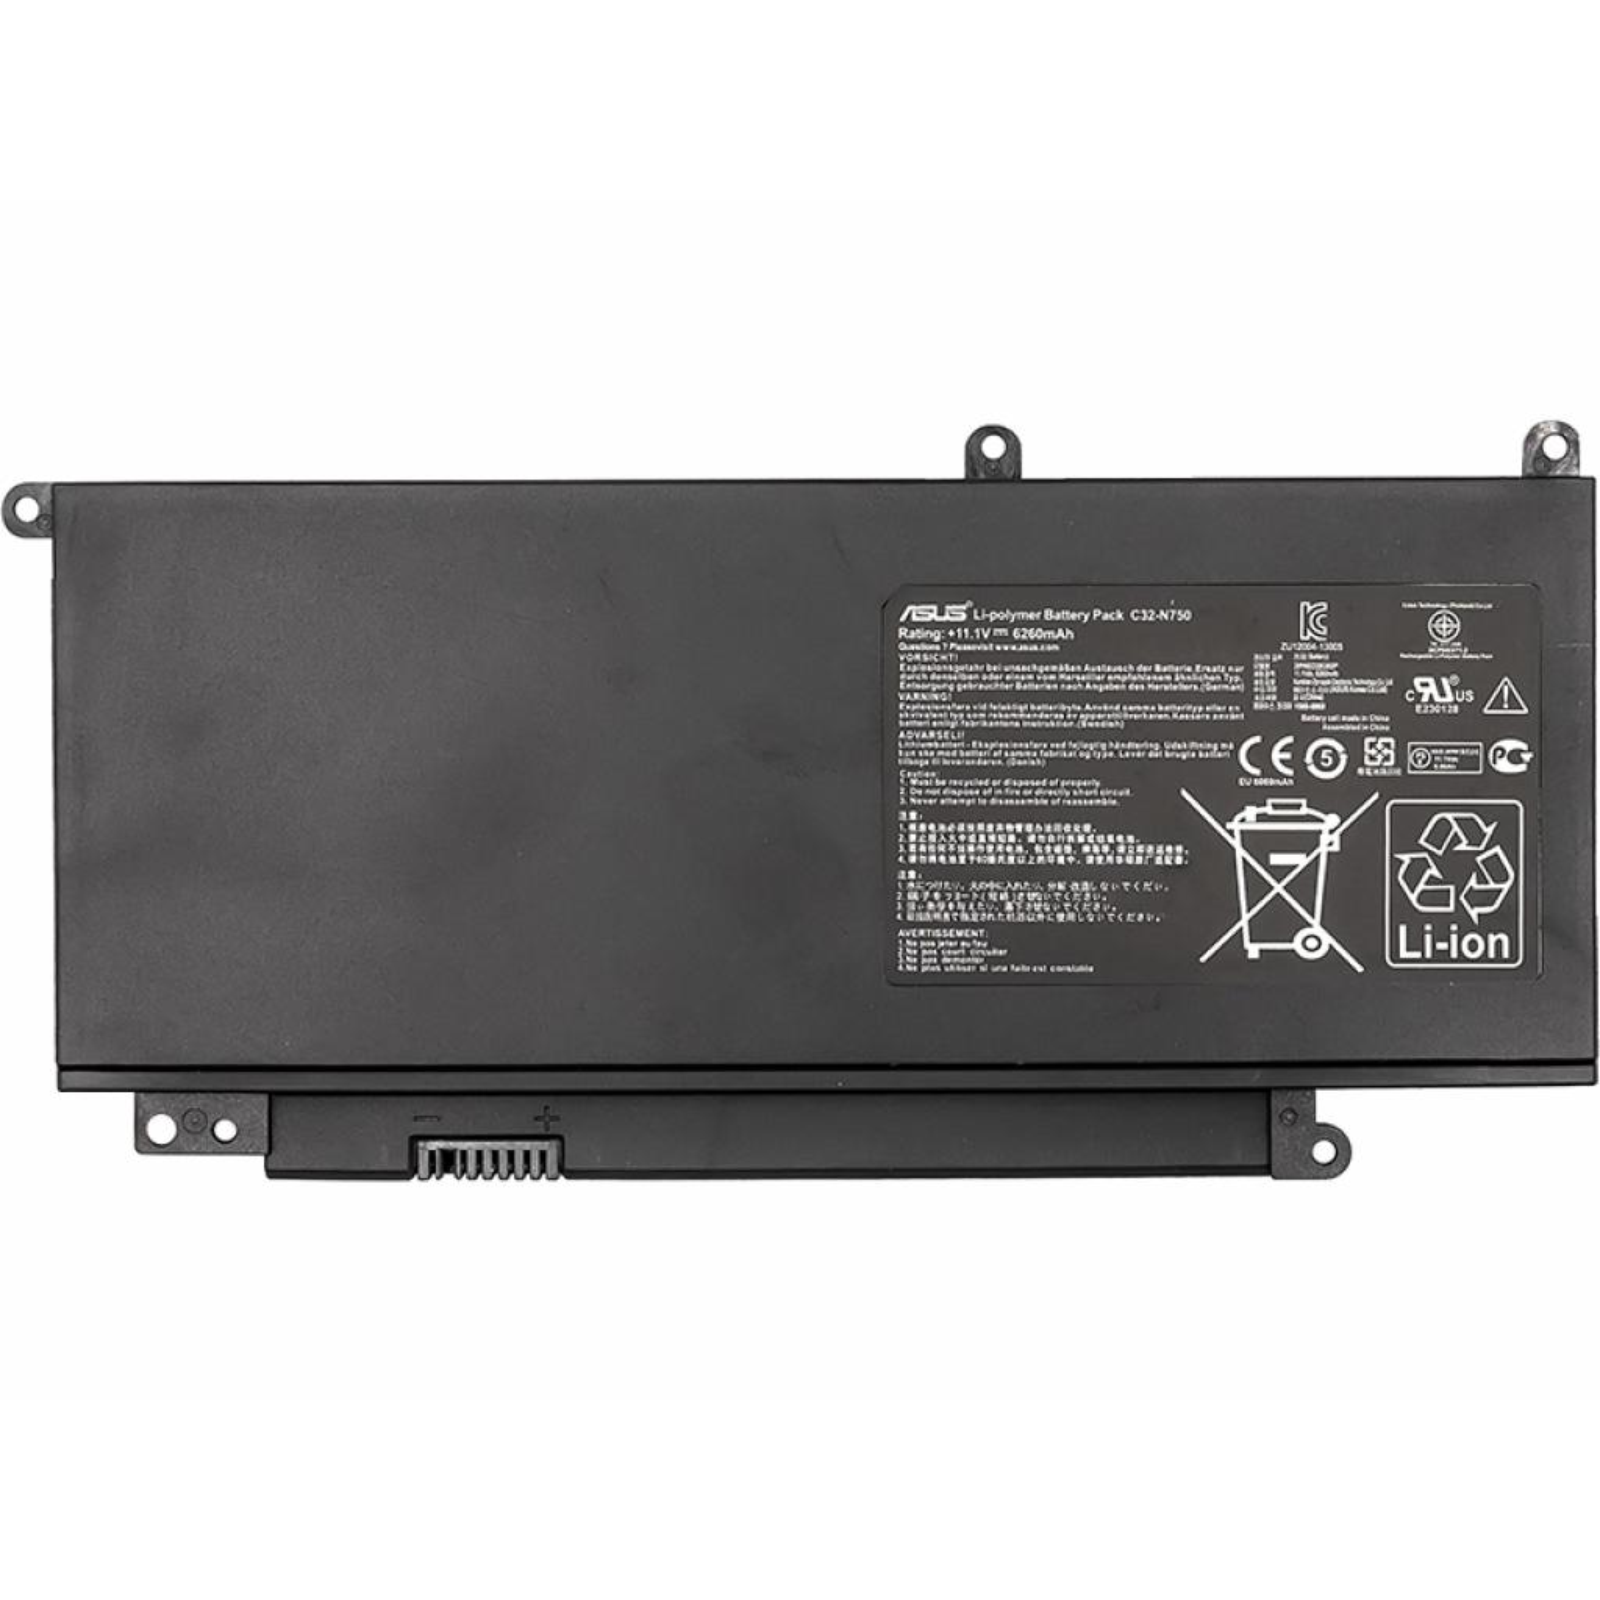 Аккумулятор для ноутбука ASUS N750 Series (C32-N750) 11.1V 69Wh PowerPlant (NB431045)